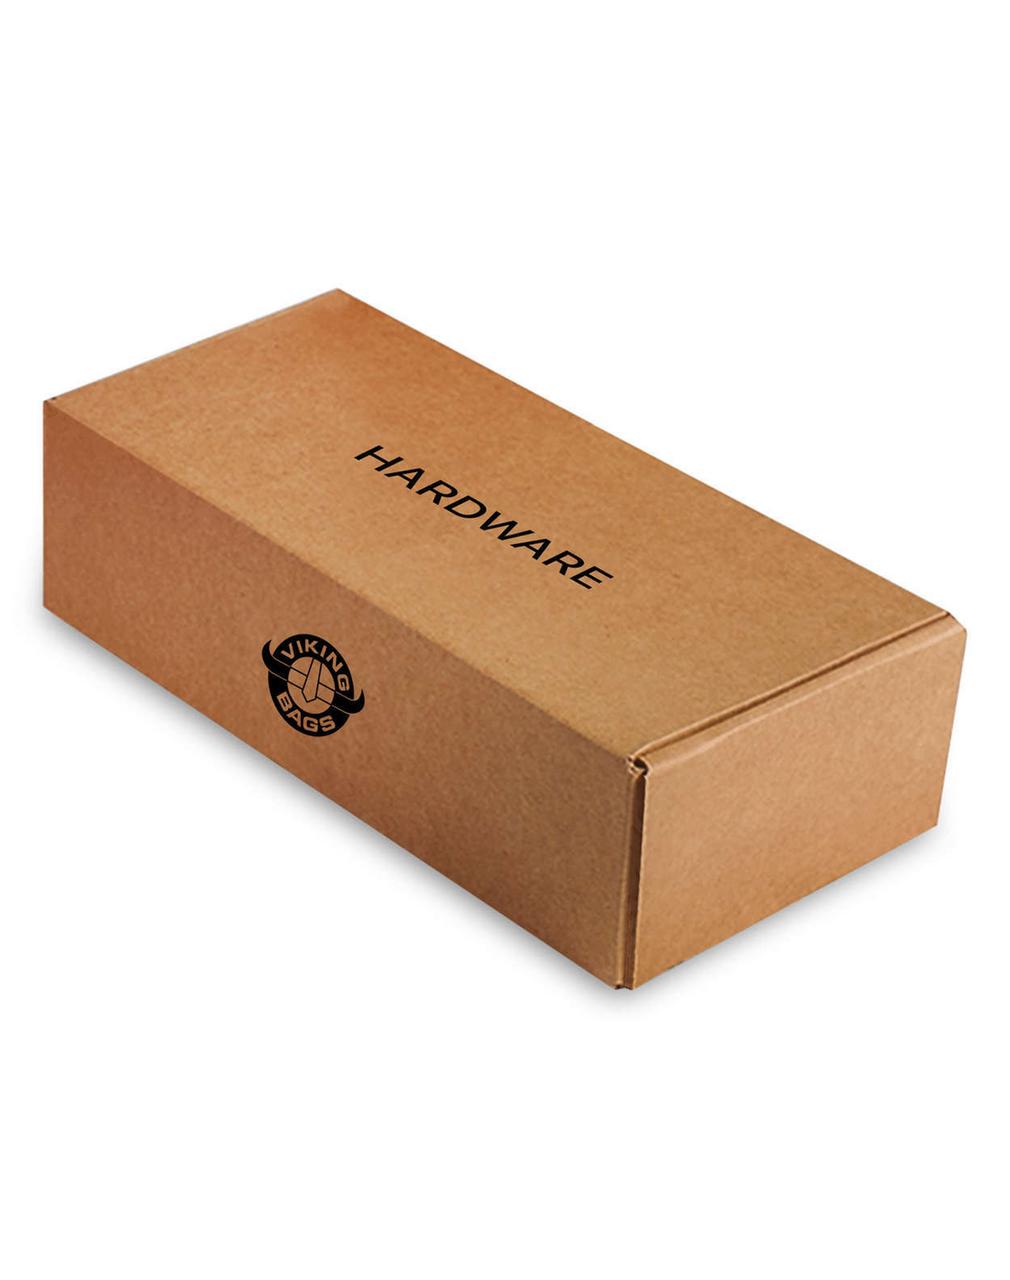 Honda VTX 1800 C Side Pocket Studded Motorcycle Saddlebags Box